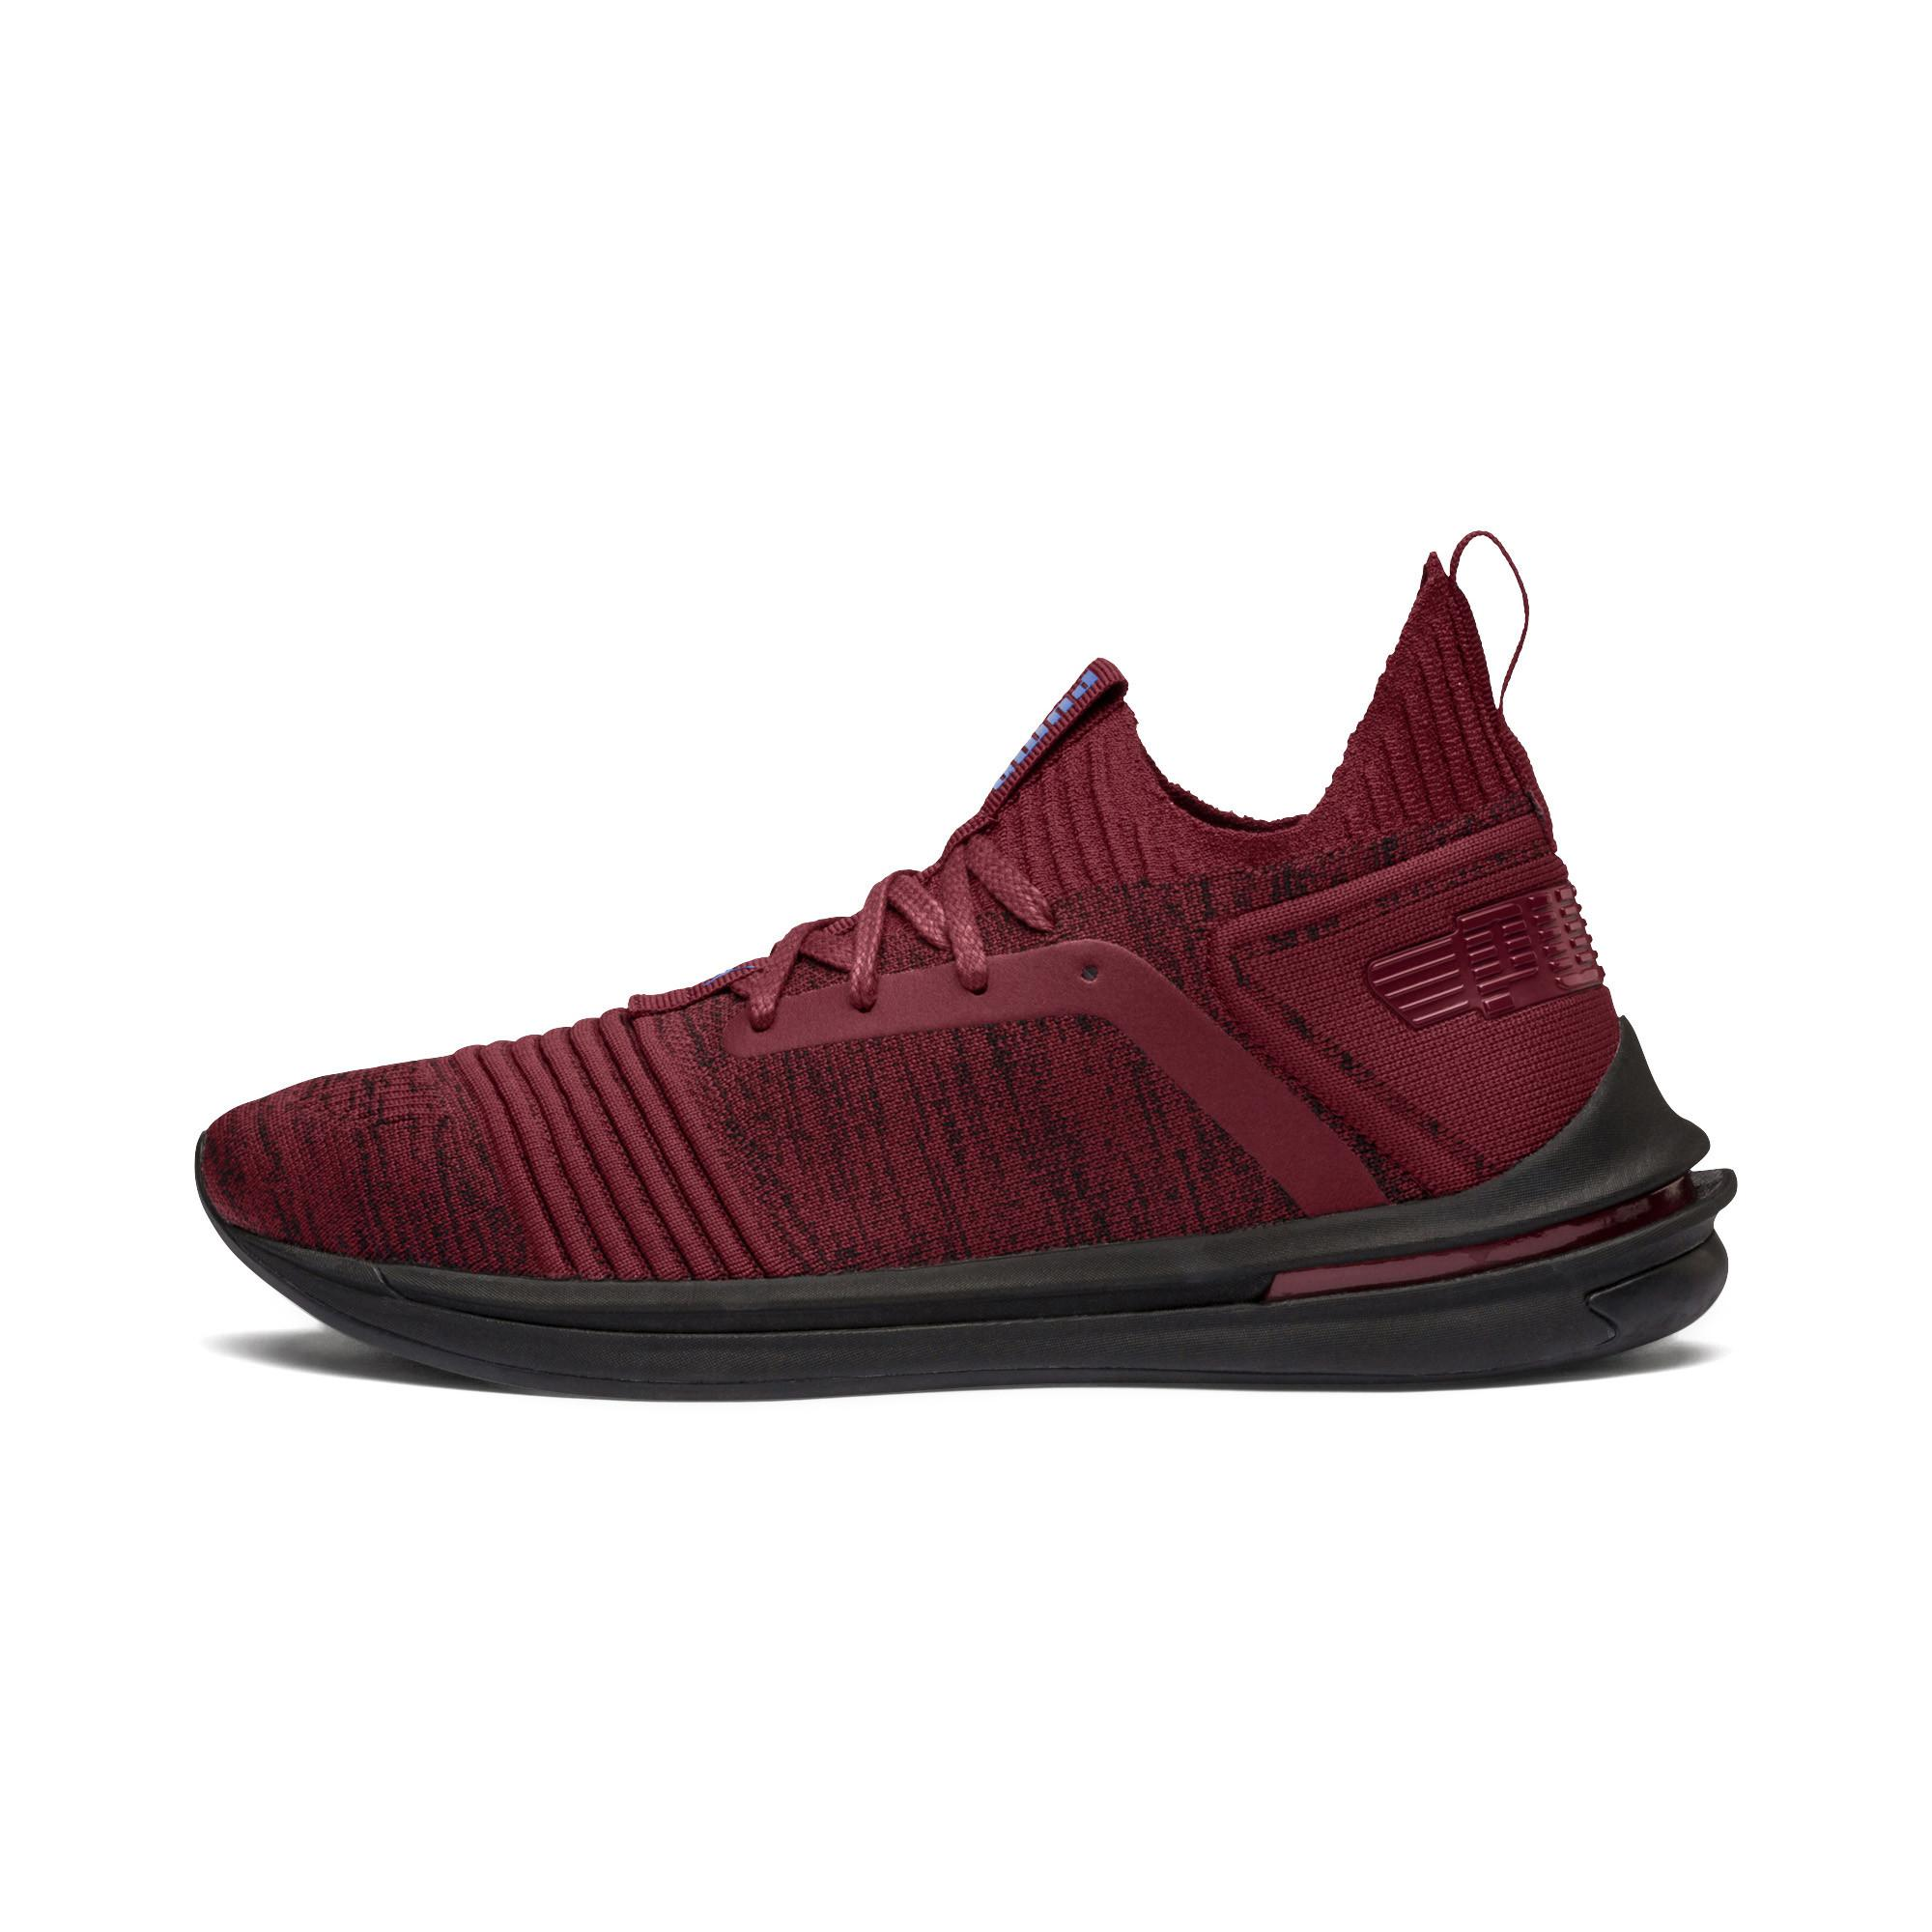 d7c2fa35640a Lyst - PUMA Ignite Limitless Sr Evoknit Men s Sneakers in Red for Men